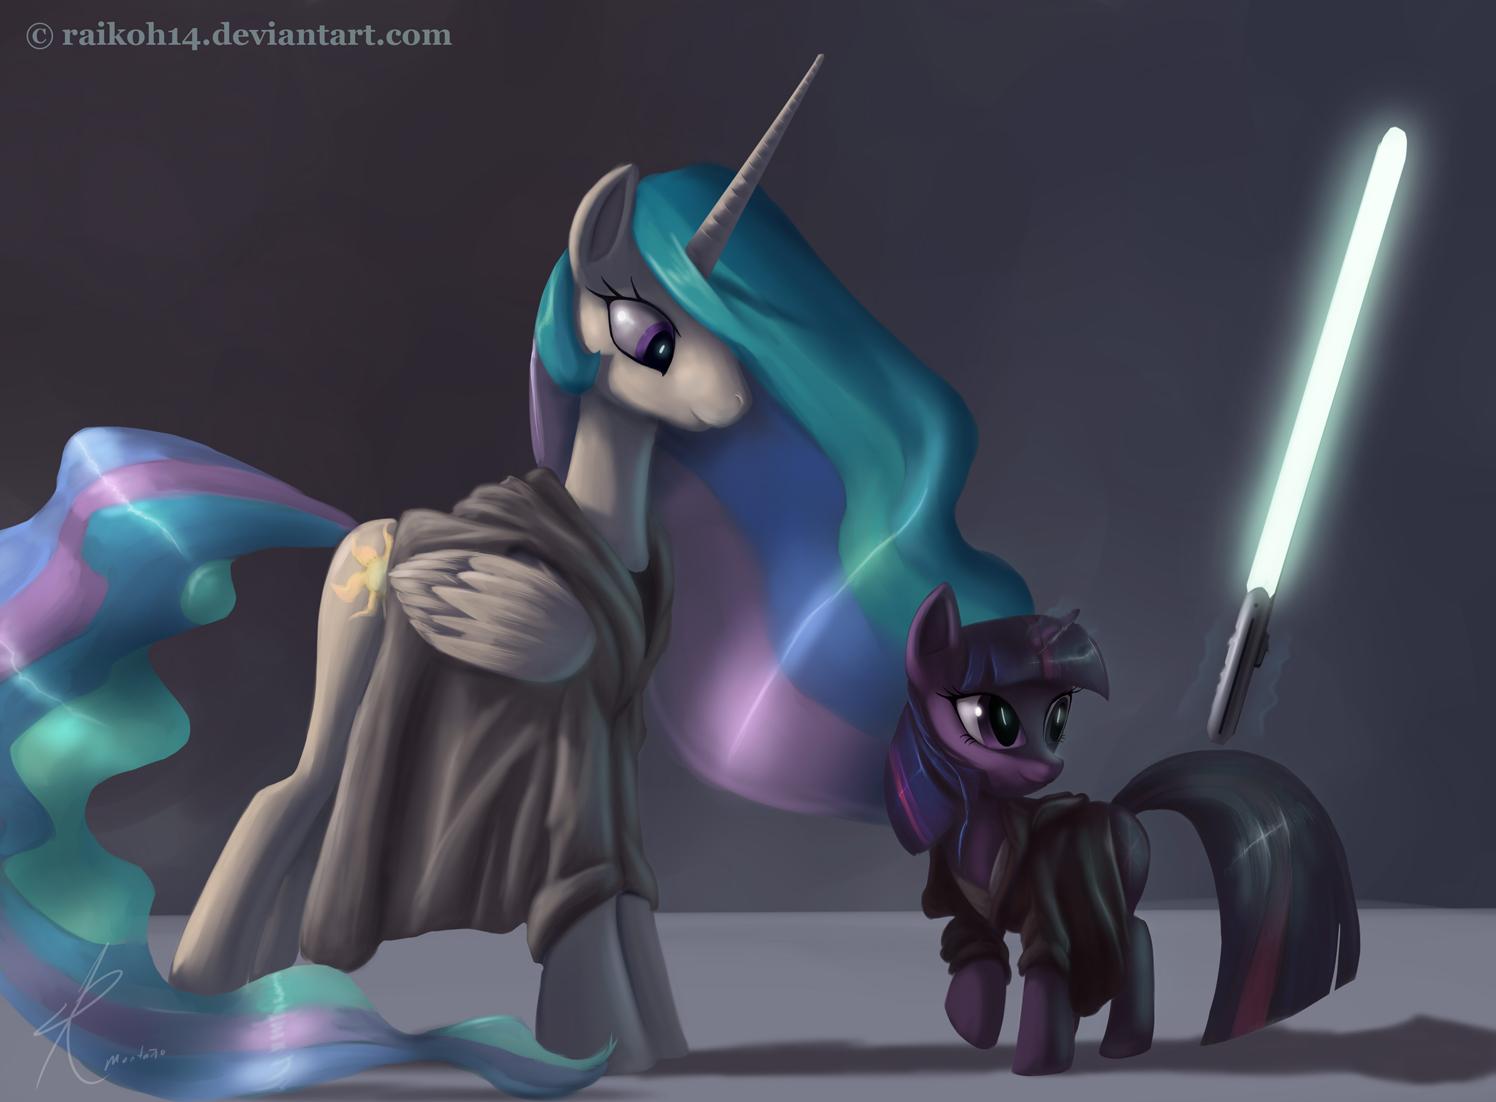 Raikon14deviantart Twilight Sparkle Princess Celestia Rarity Pinkie Pie Pony Vertebrate Horse